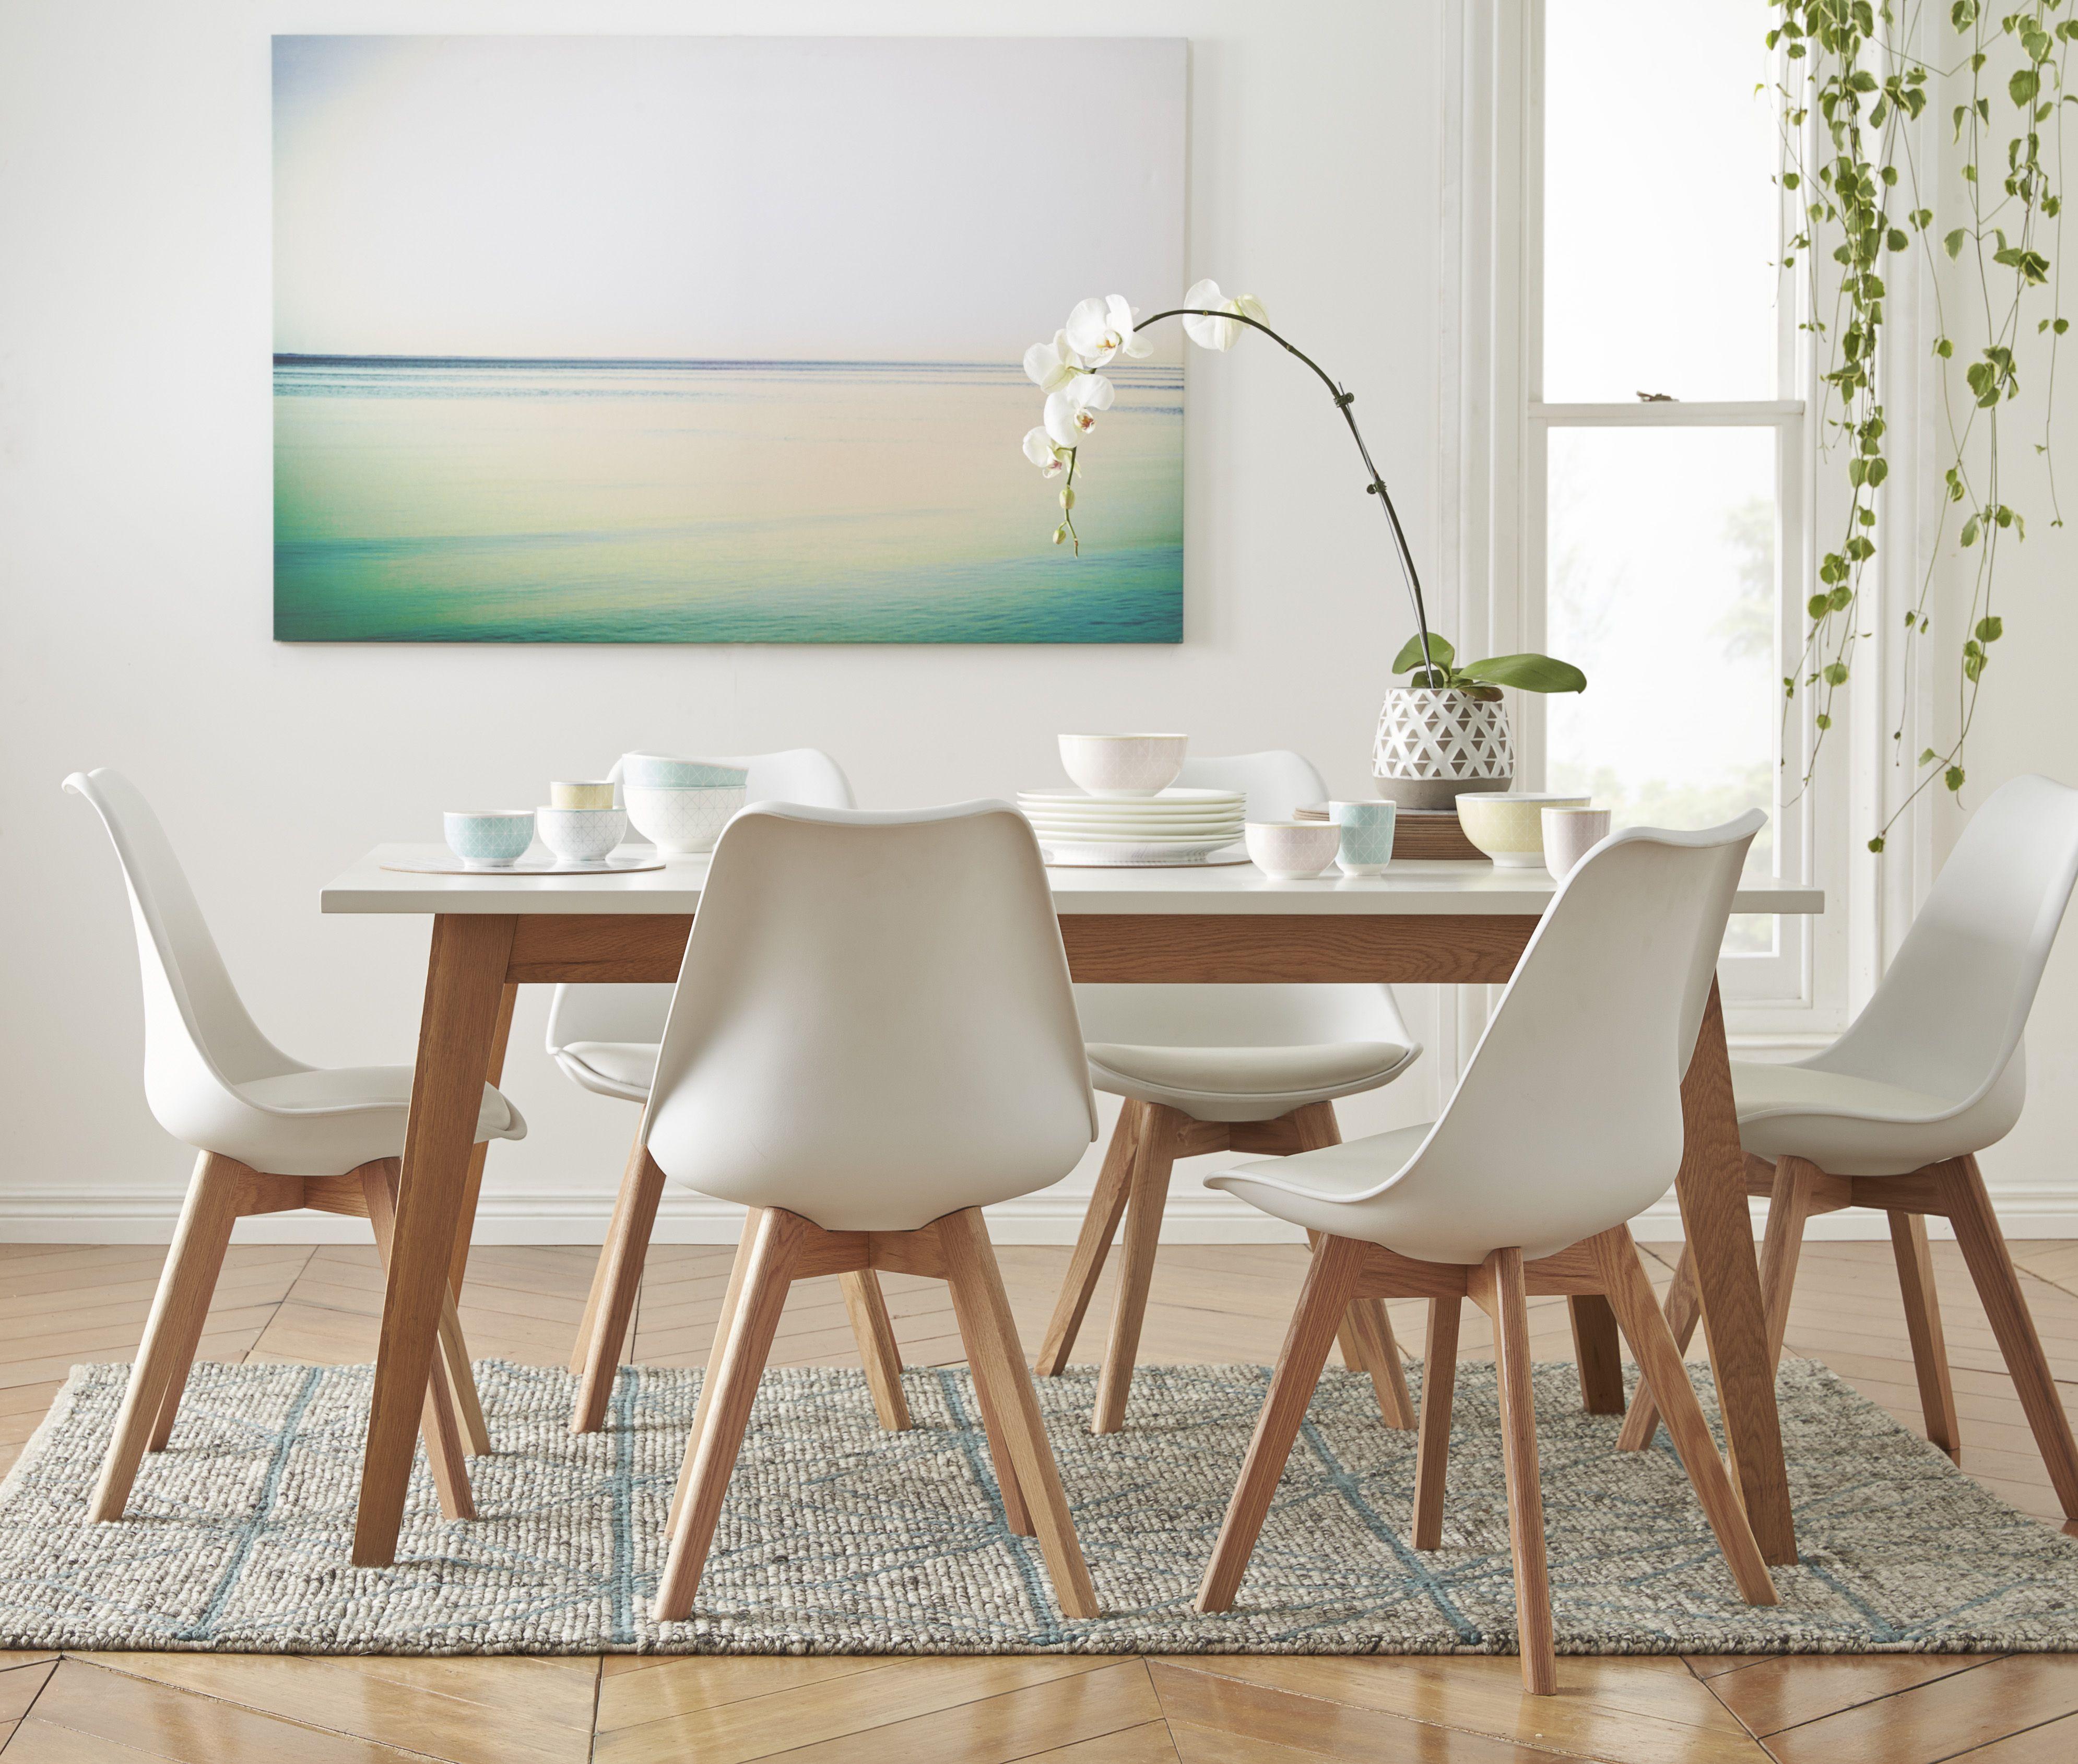 Frieda Dining Table 160x90cm In Oak White 699 Freedomaw15 Freedomaustralia